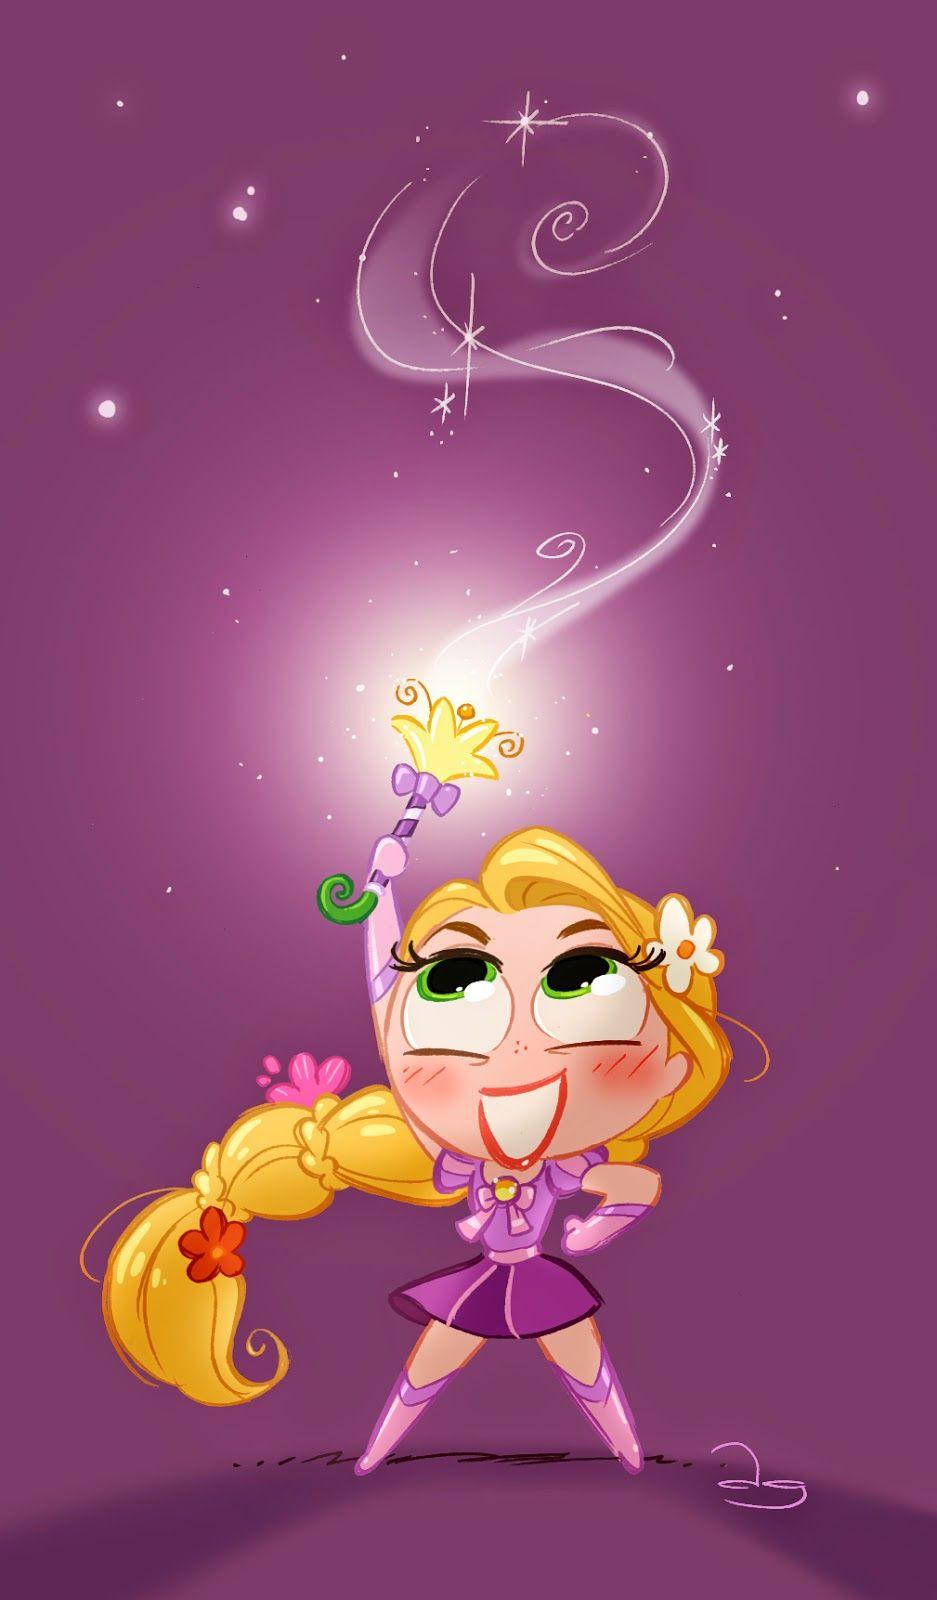 David gilson chibie magical punzie dessin kawaii - Disney princesse raiponce ...